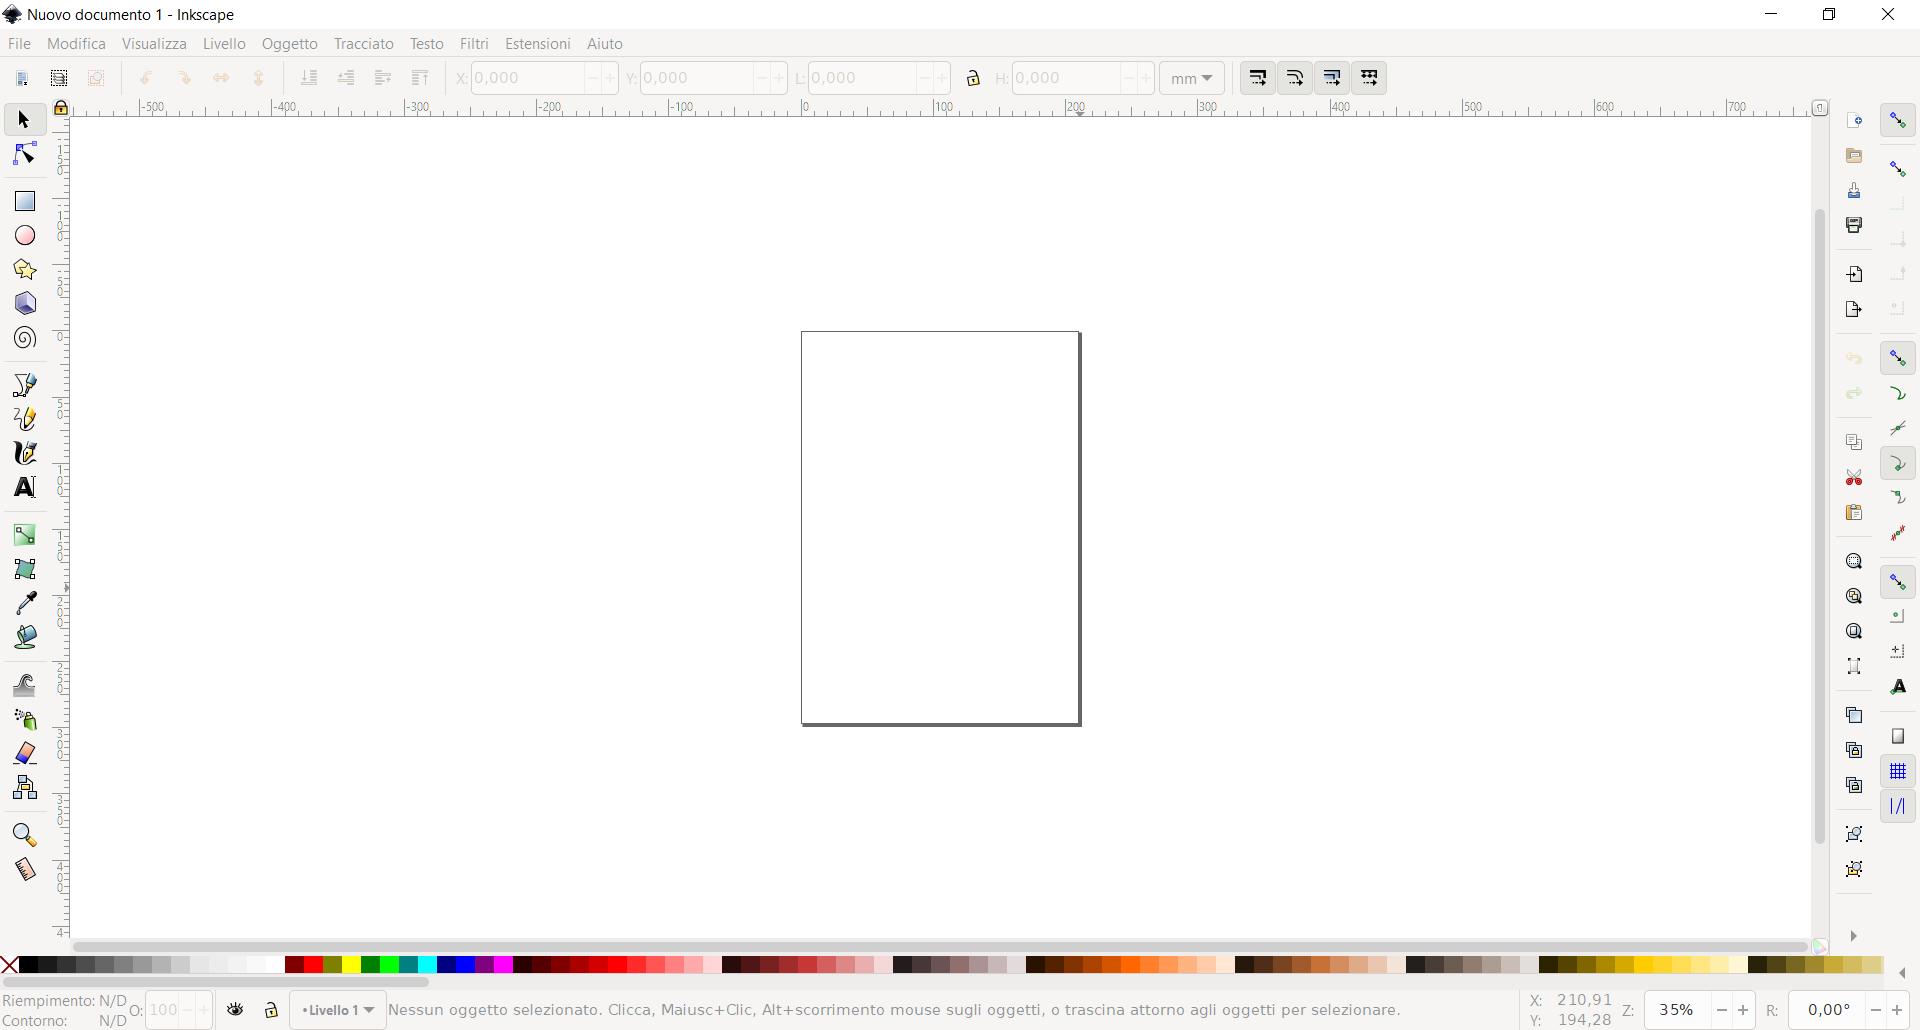 Schermata di avvio di Inkscape